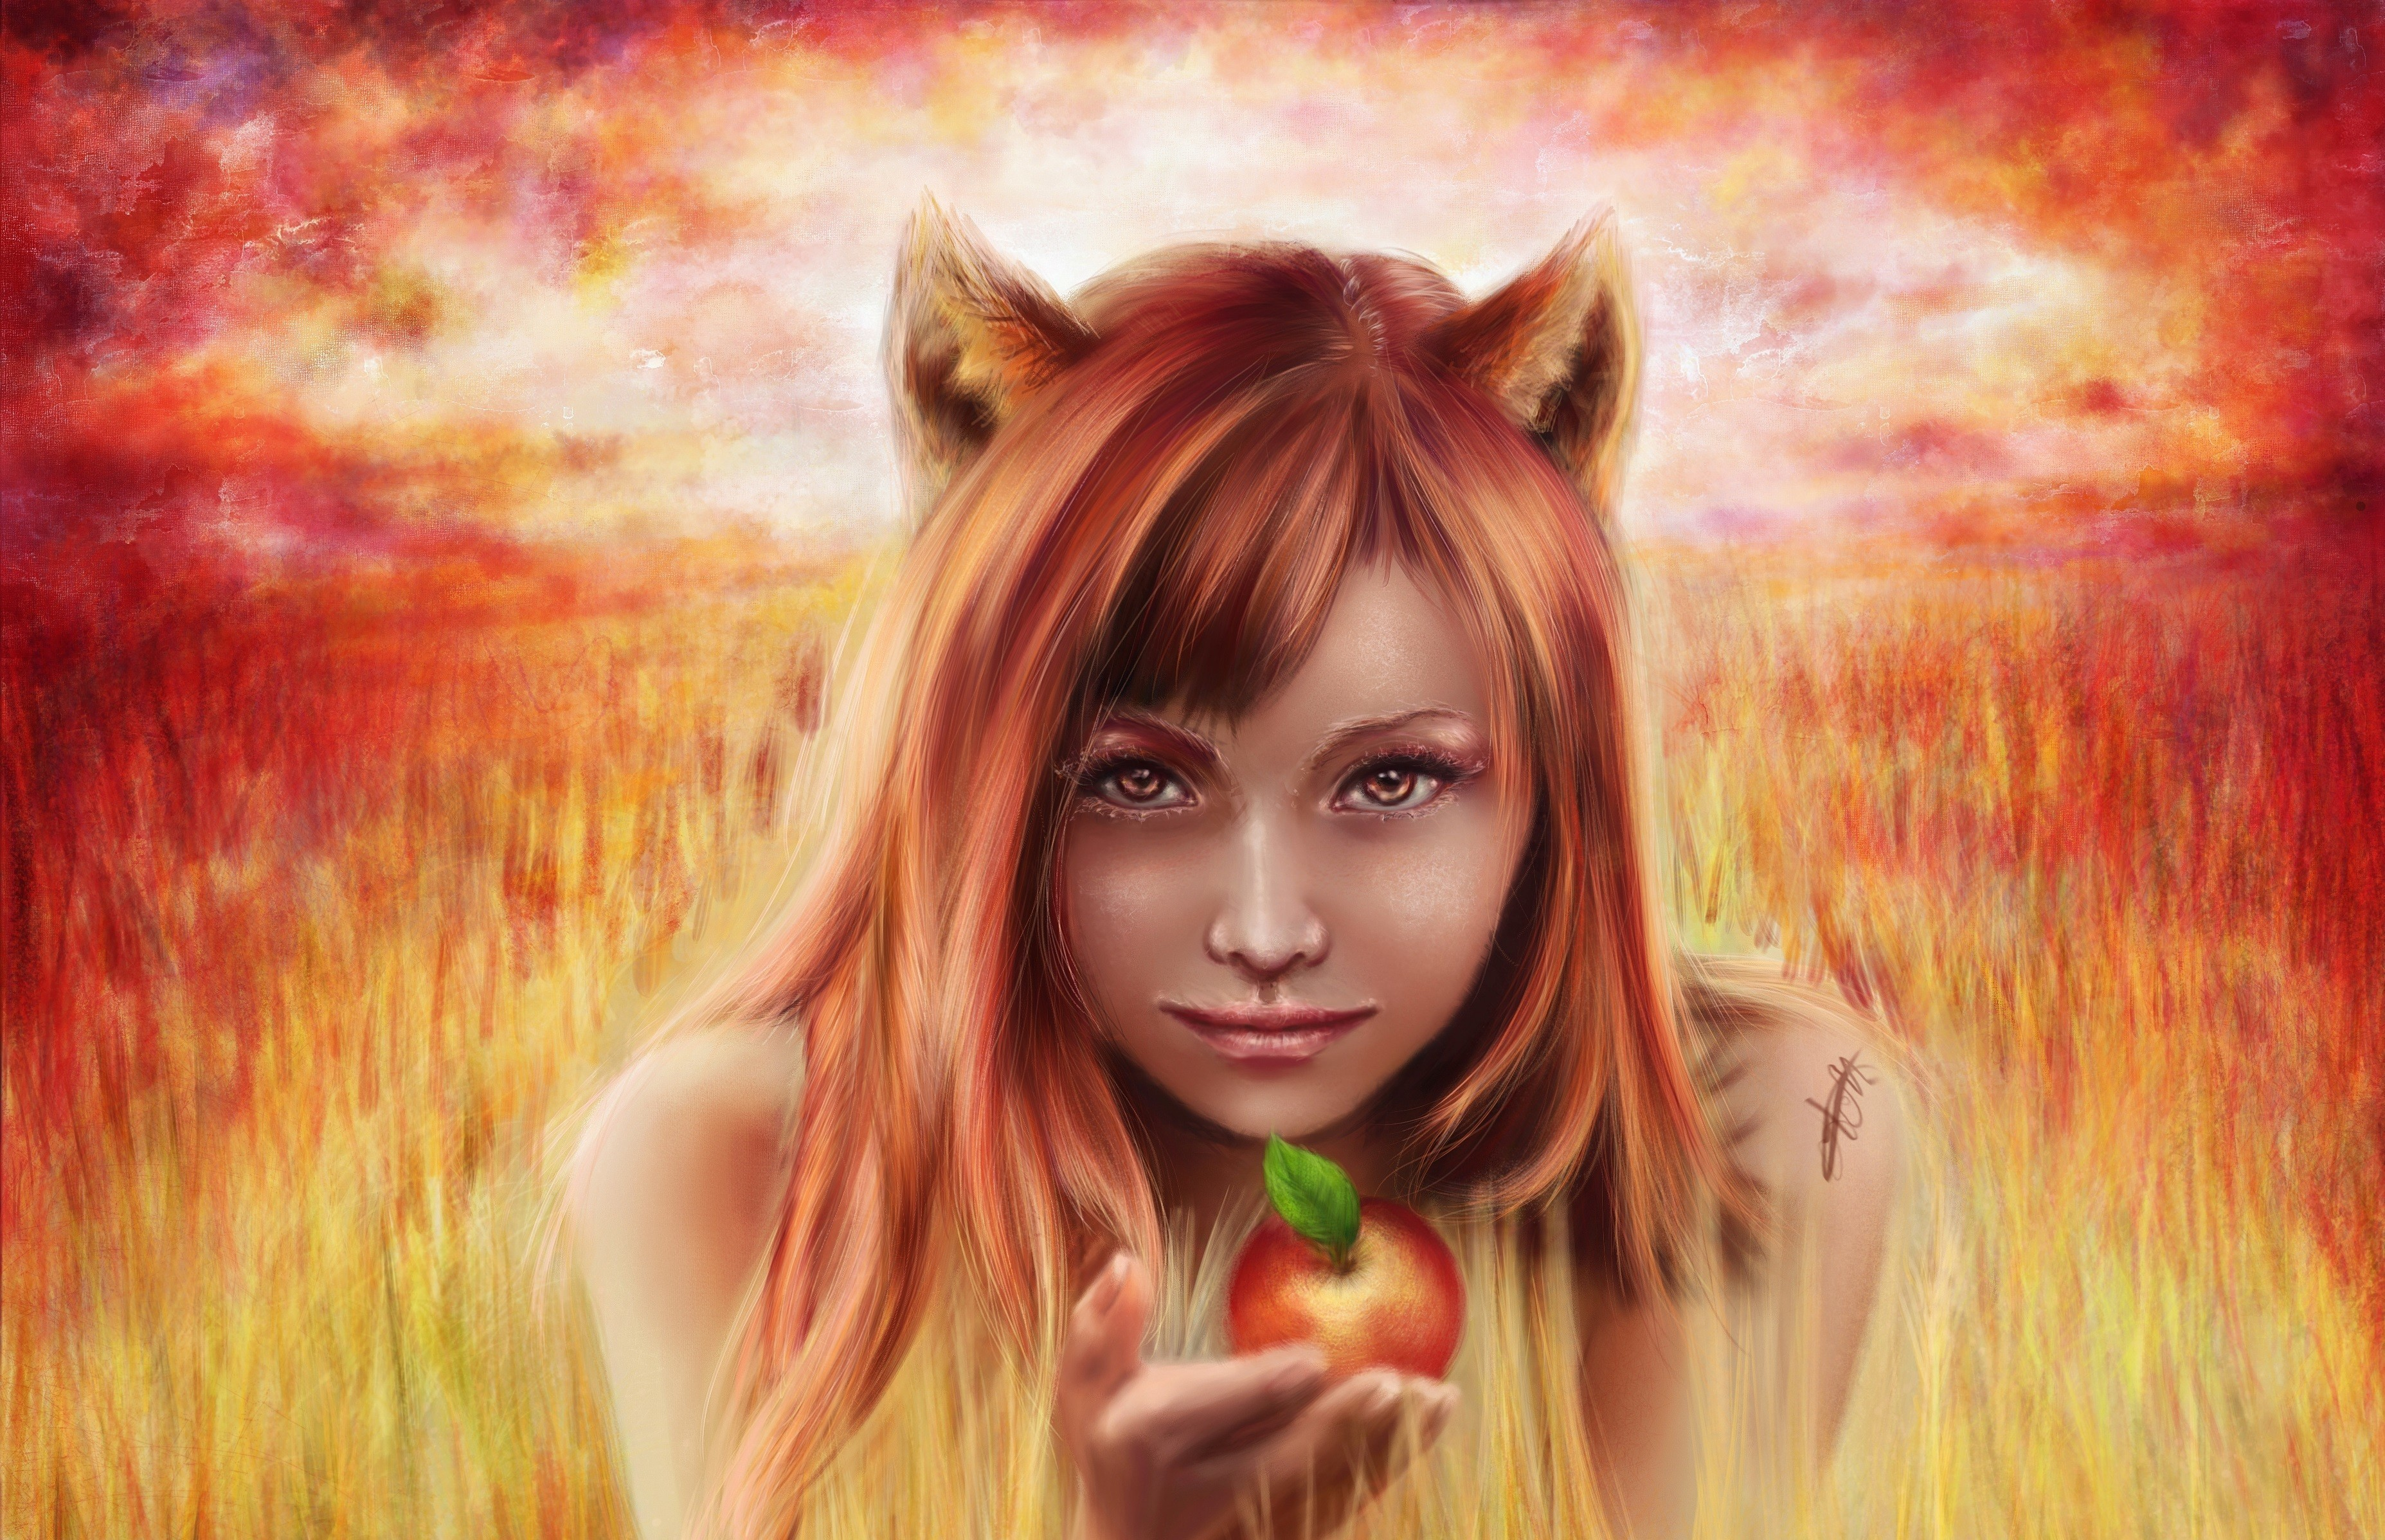 General 3710x2396 fantasy art apples women artwork